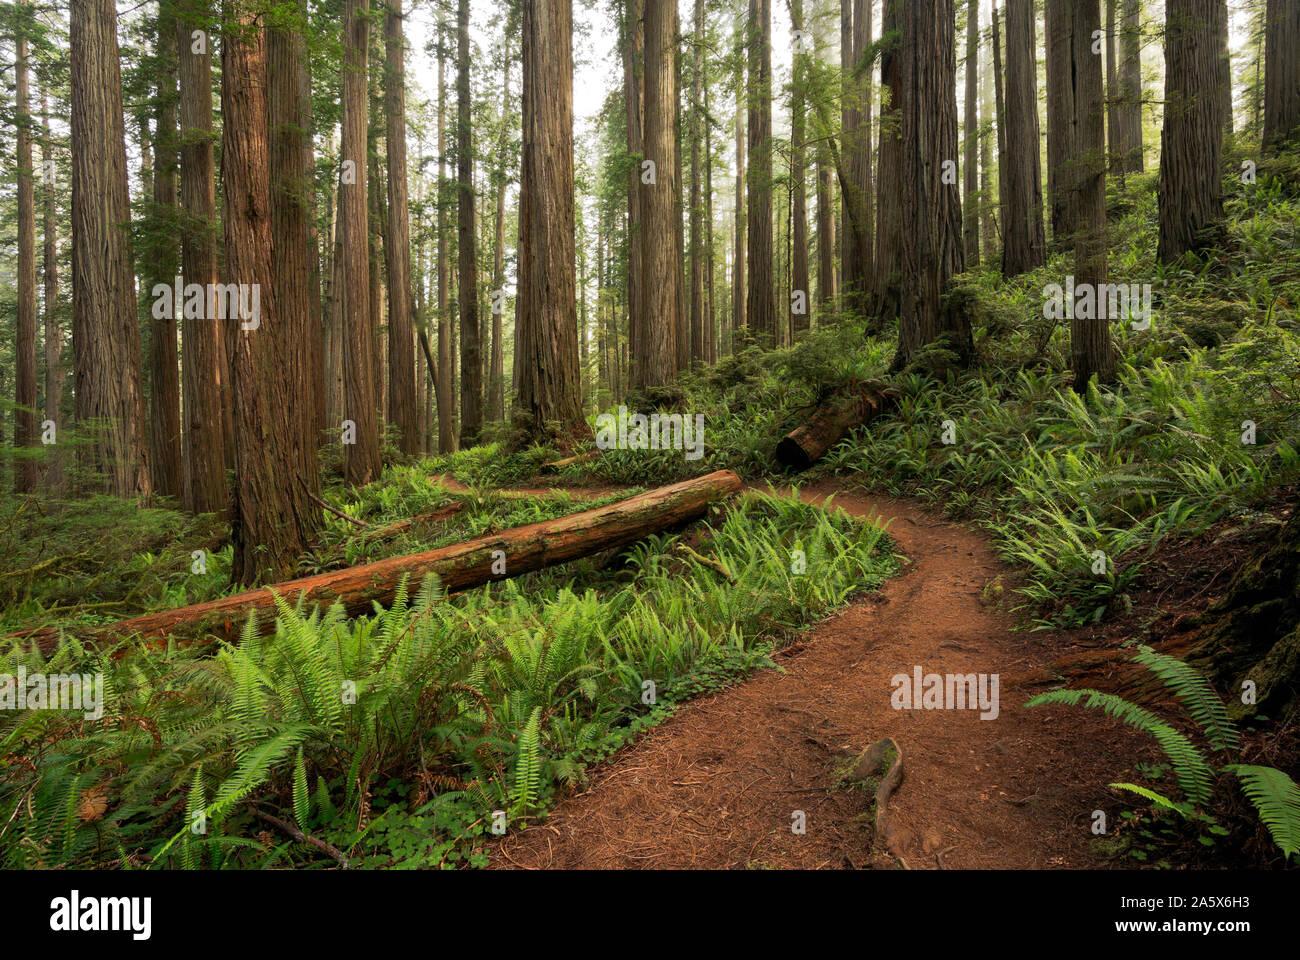 CA03765-00...California - El árbol de Boy Scouts sendero serpenteante a través de un bosque de secoyas en Jedediah Smith Redwoods State Park; parte de Redwoods National a Foto de stock